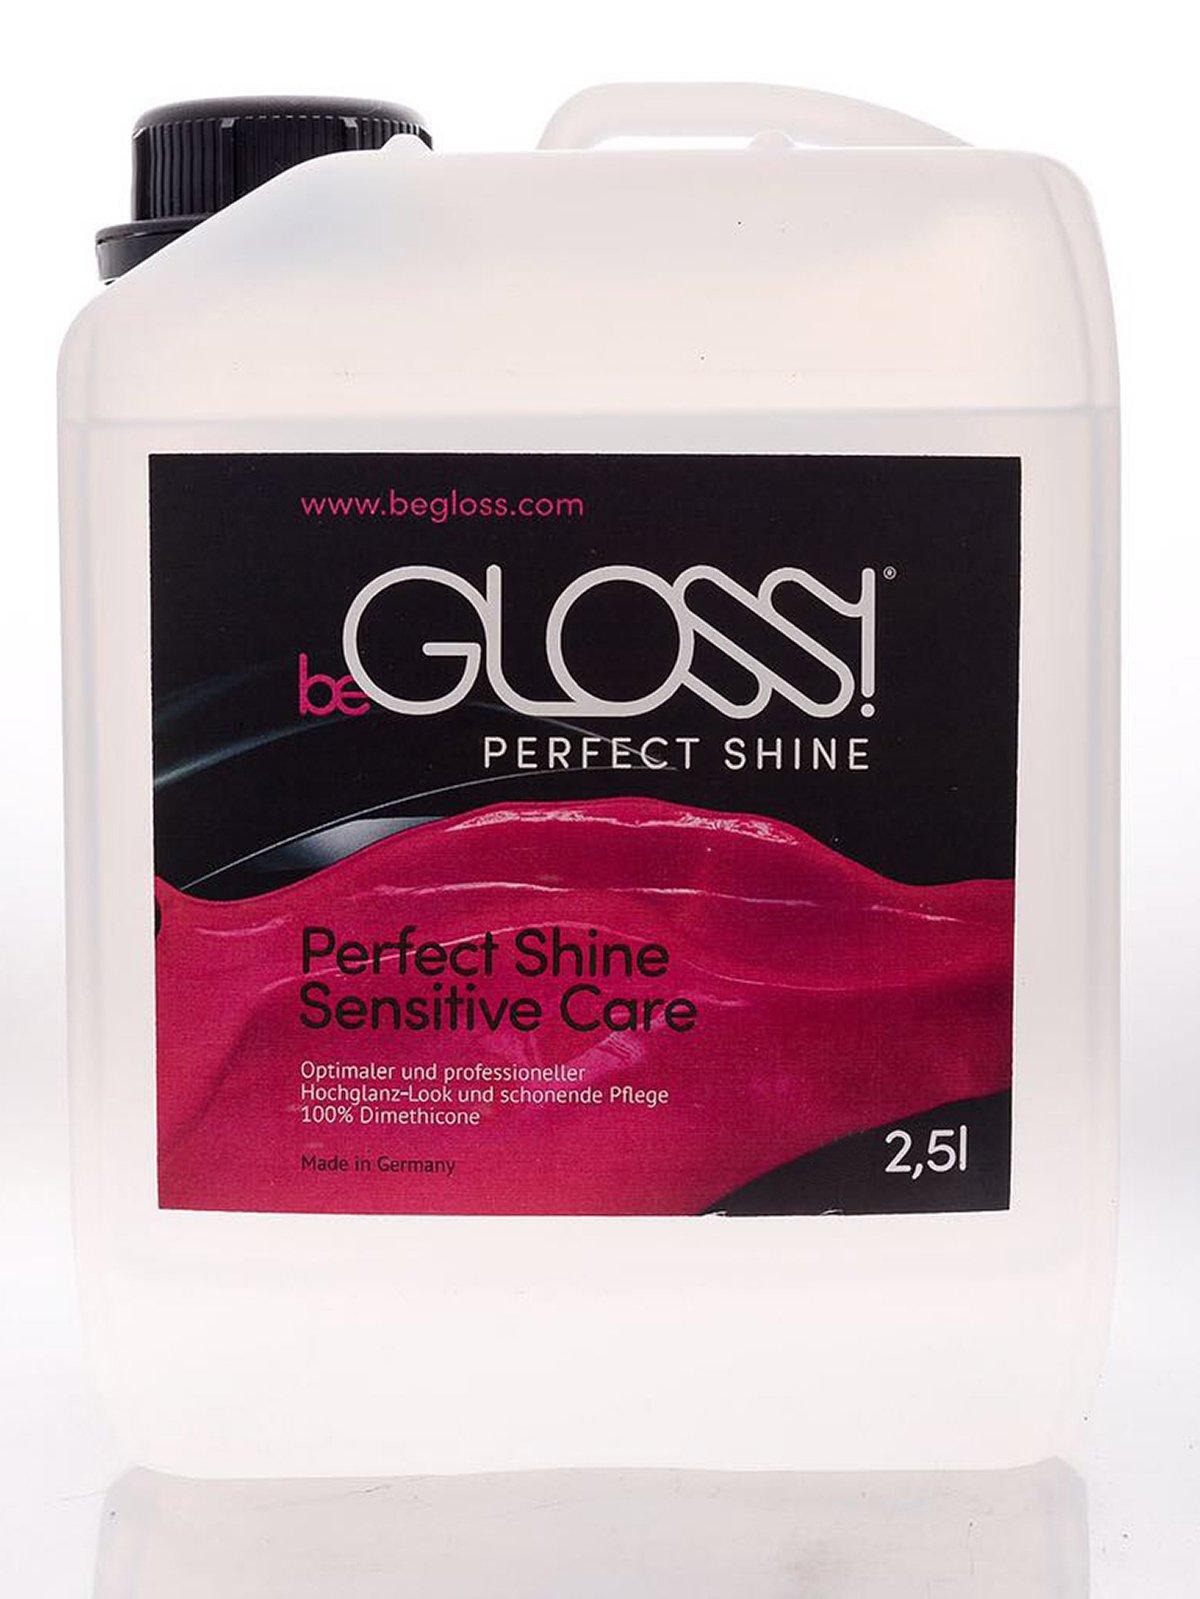 beGLOSS Perfect Shine 2500ml Latex Shiner - For Latex Clothing by beGloss